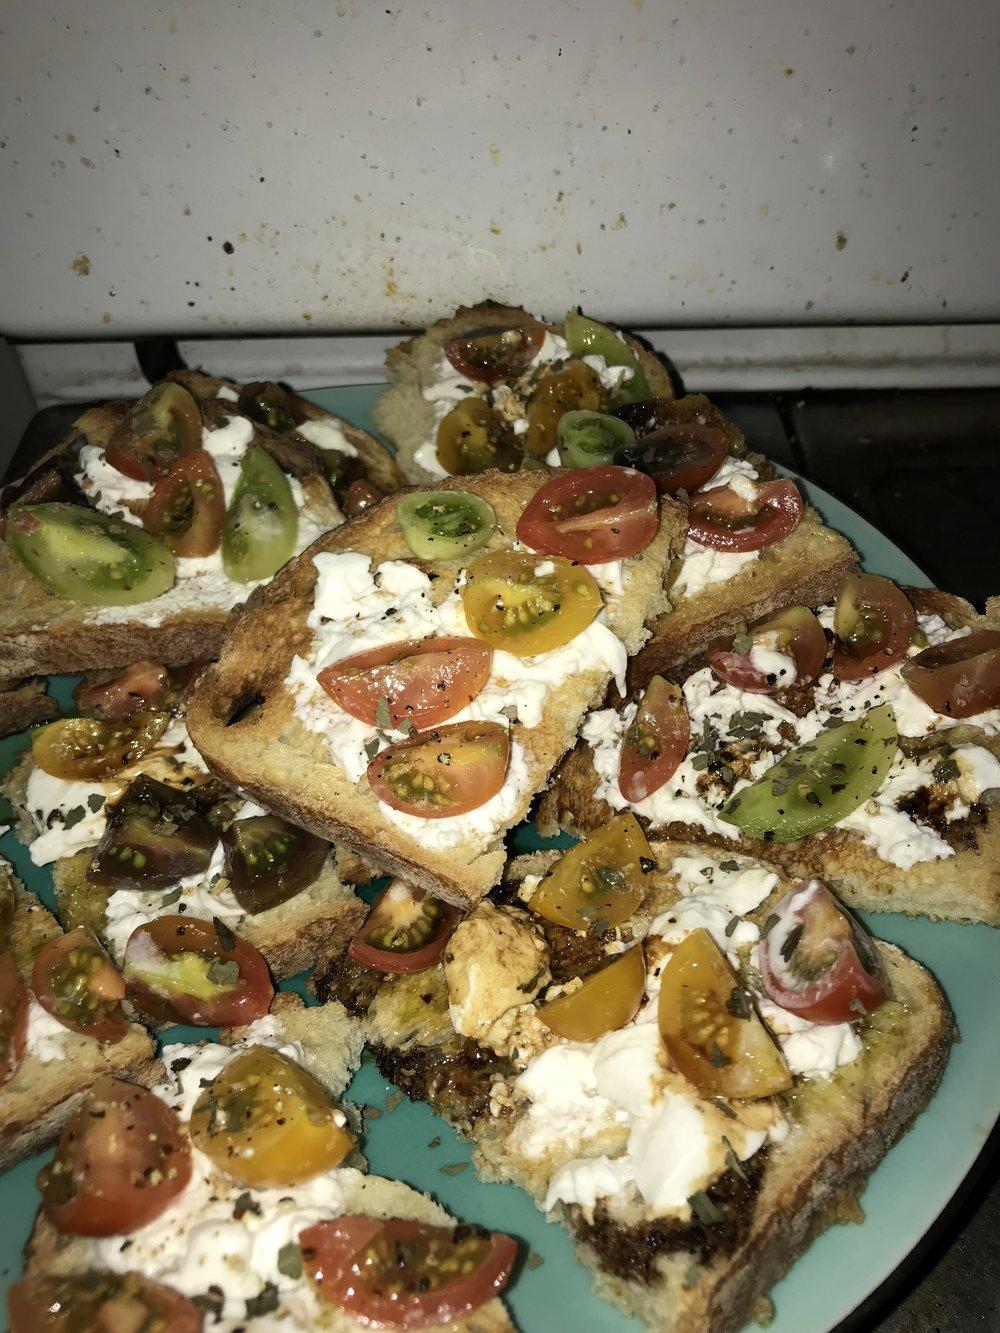 Bruschetta with burrata and heirloom tomatoes.